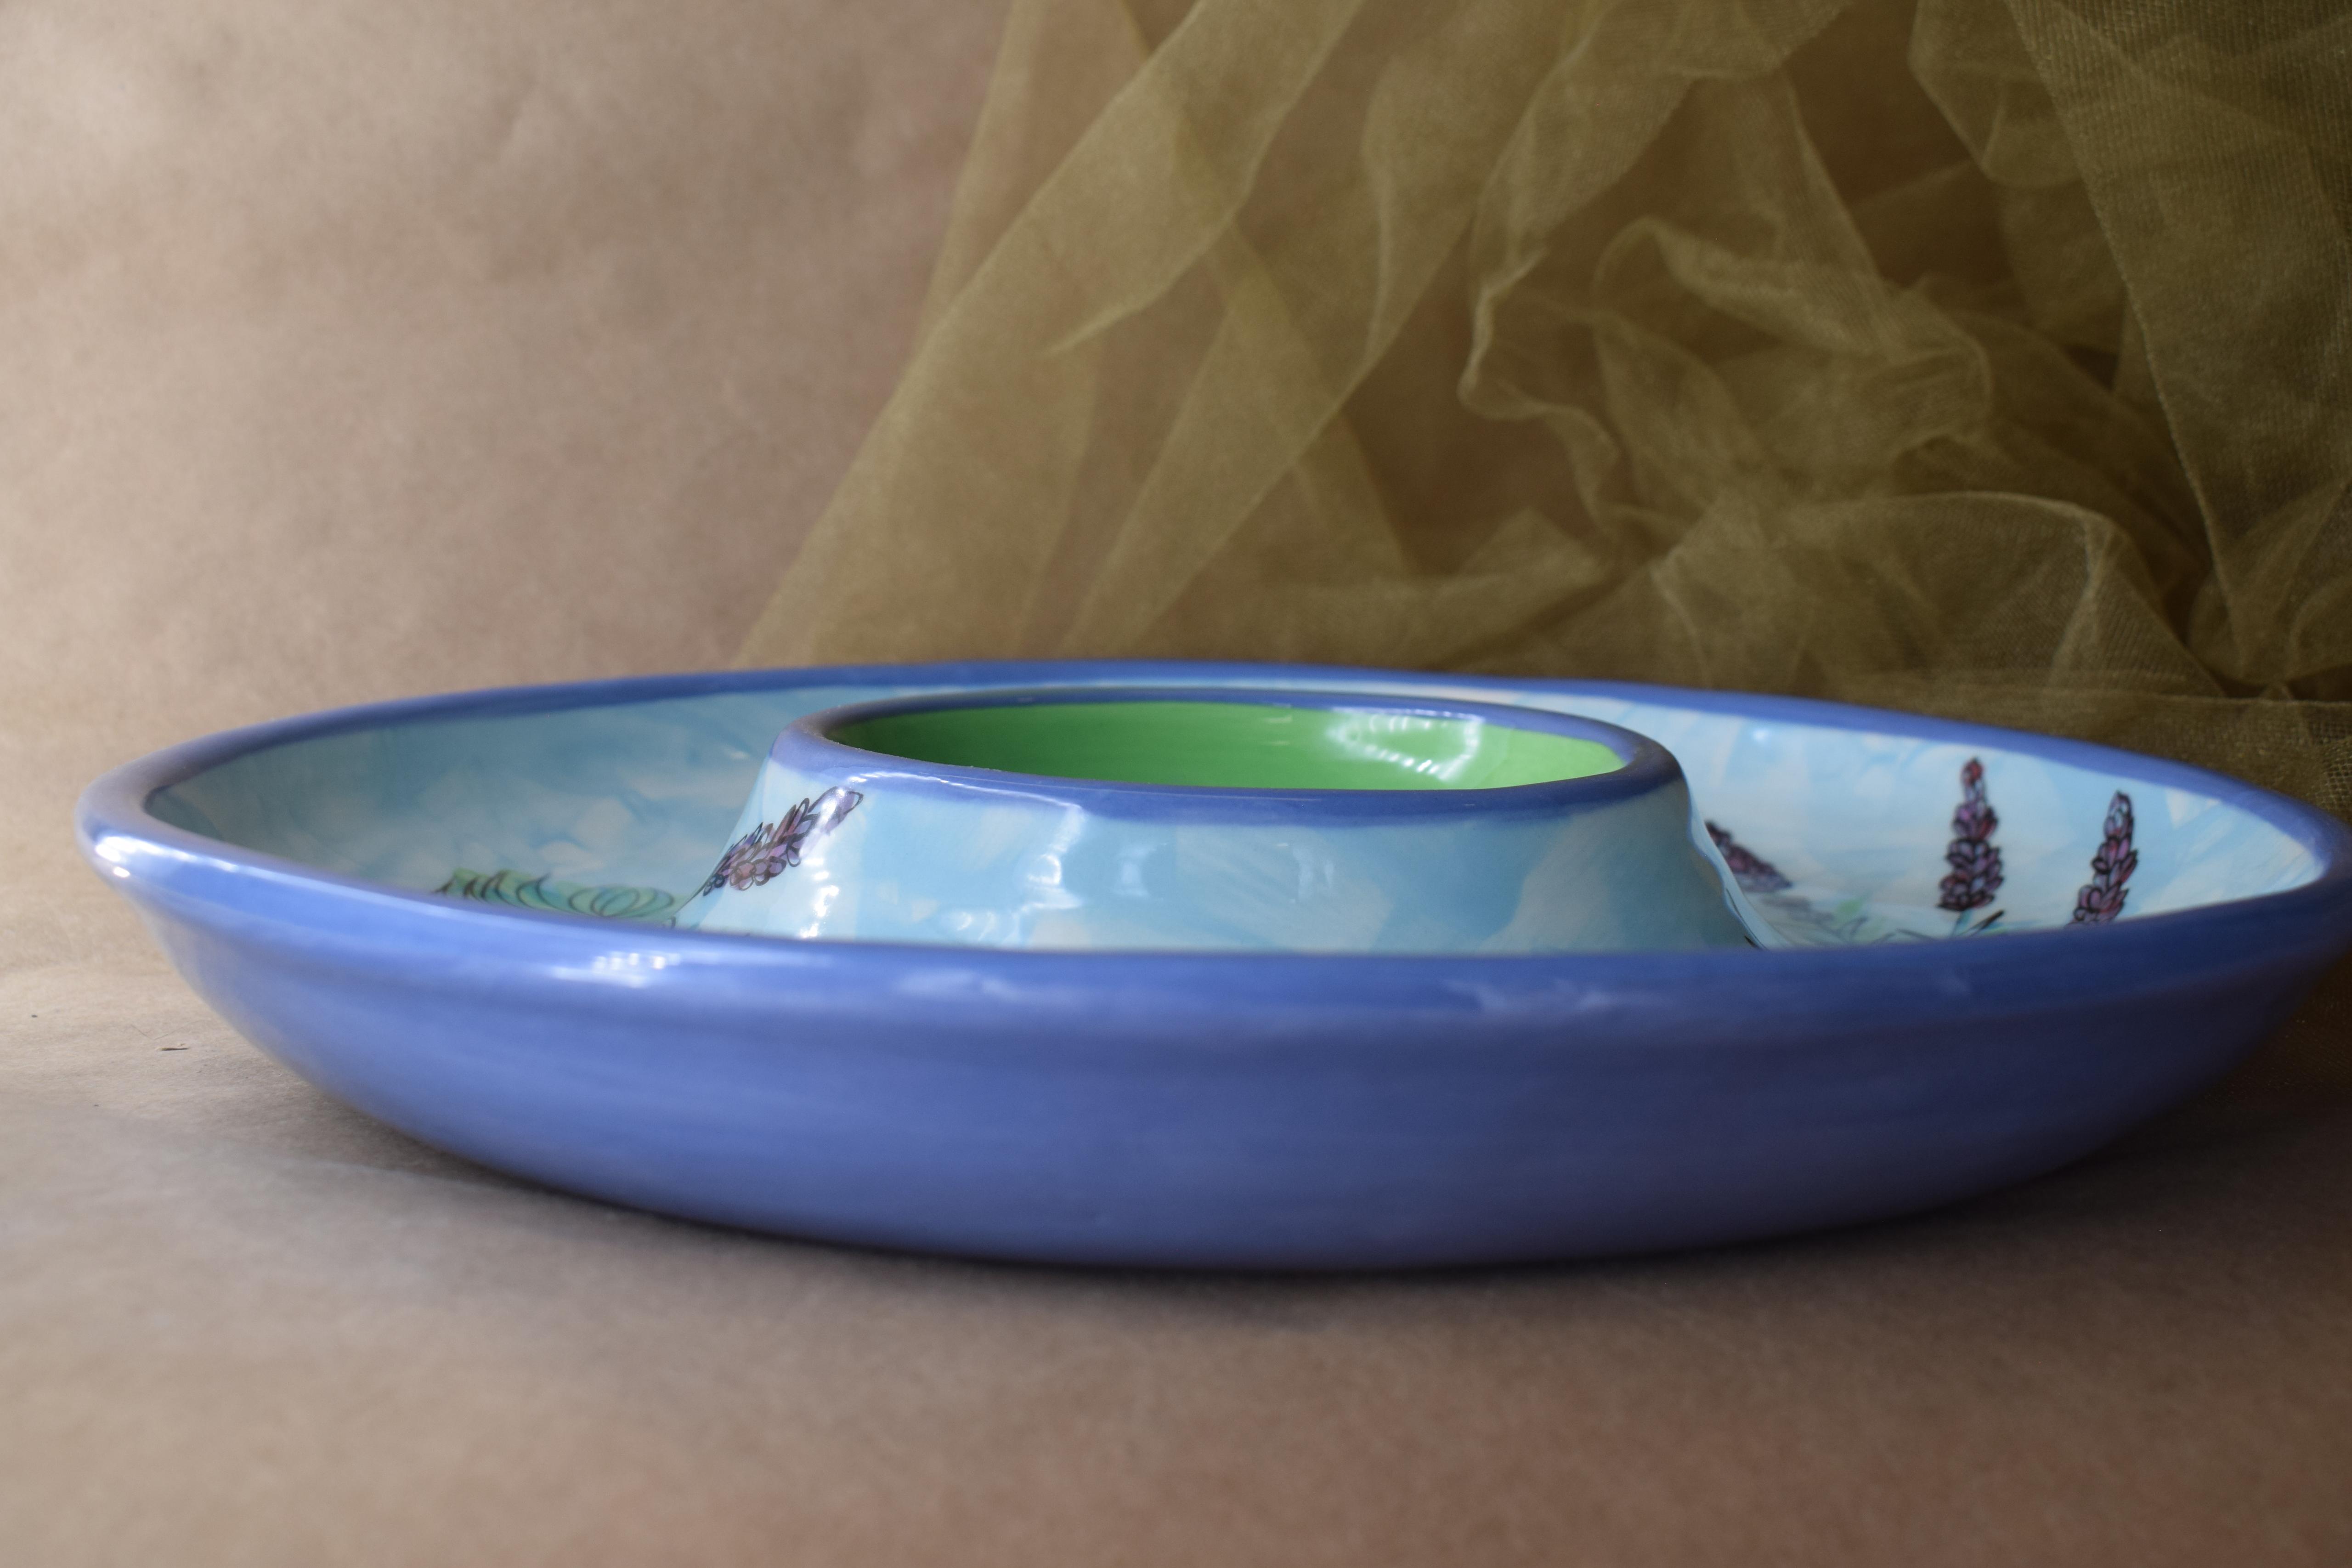 (CD11-EL) Chip and Dip-English Lavender